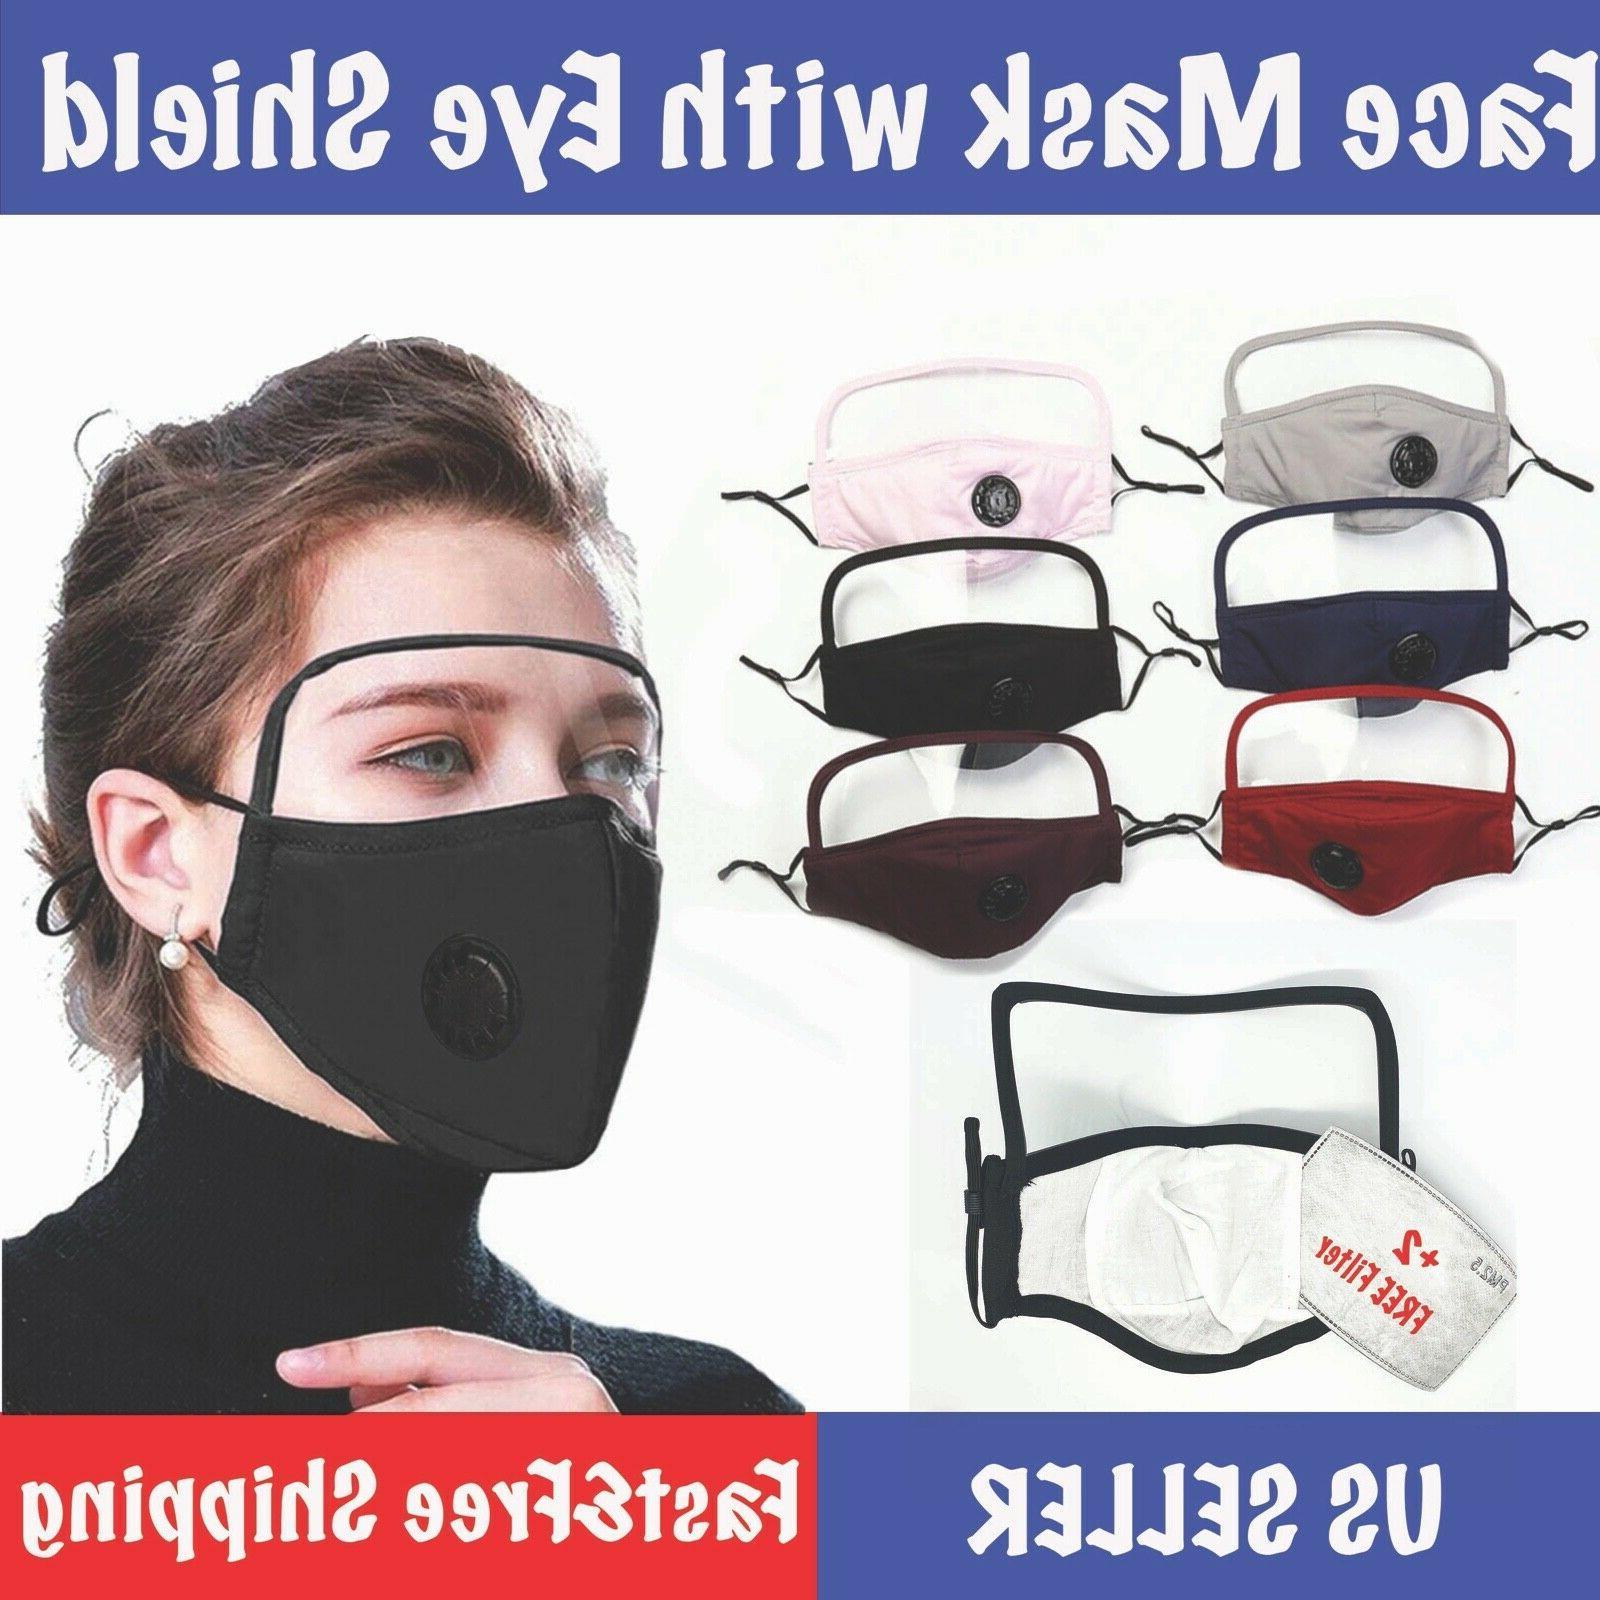 reusable cotton face mask with eye shield